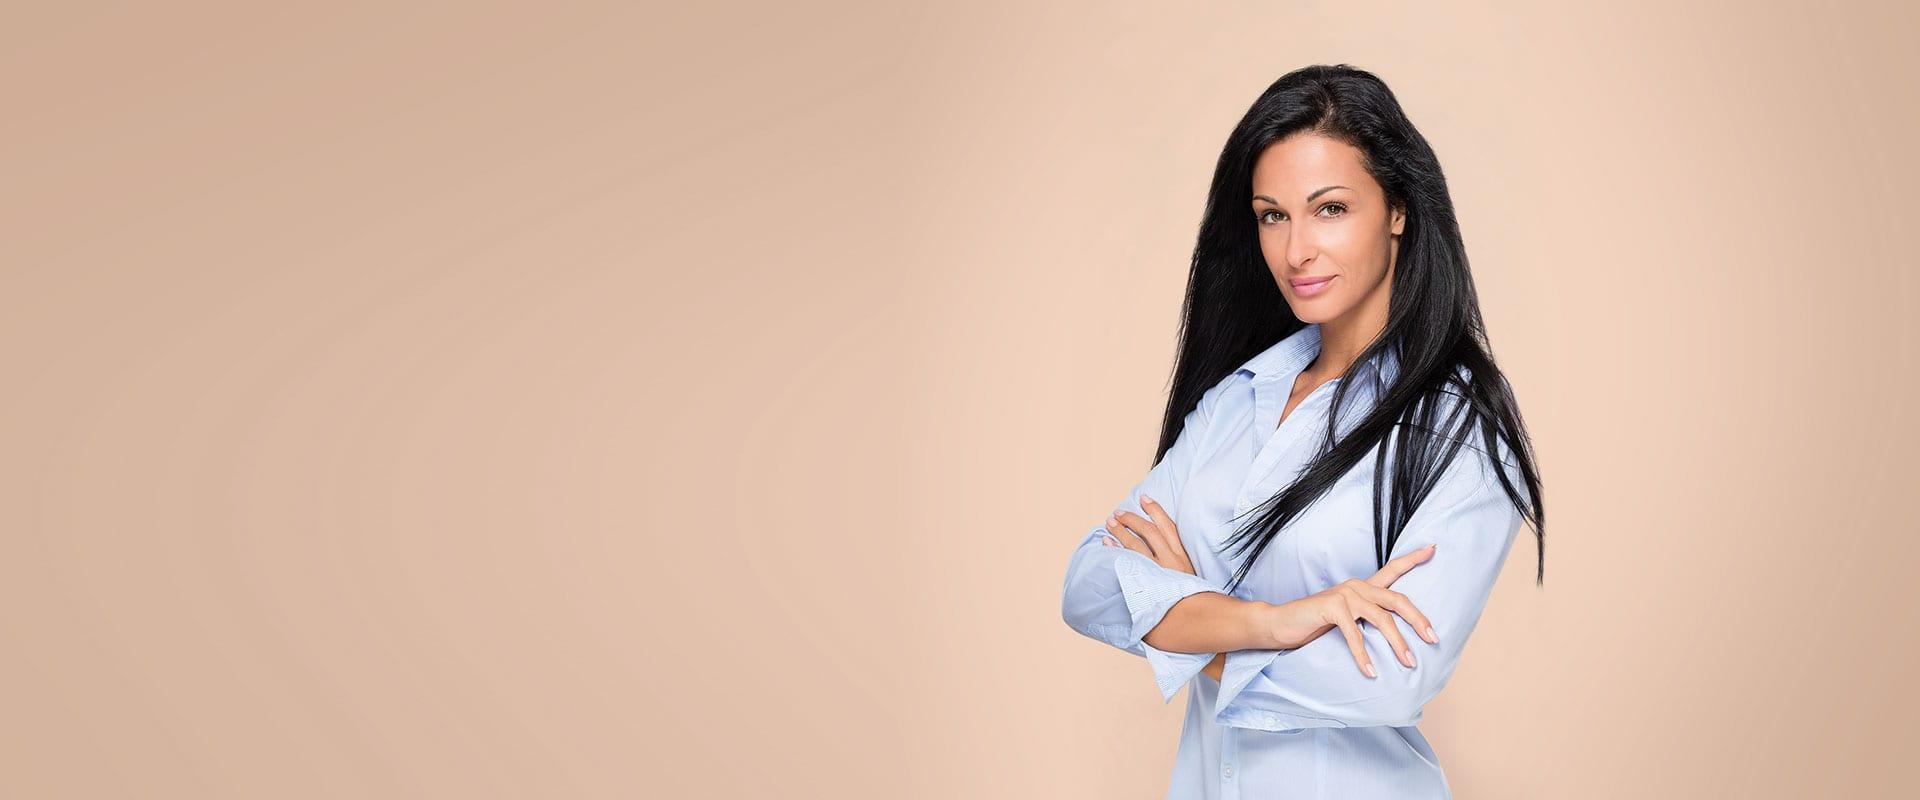 Female model on beige background